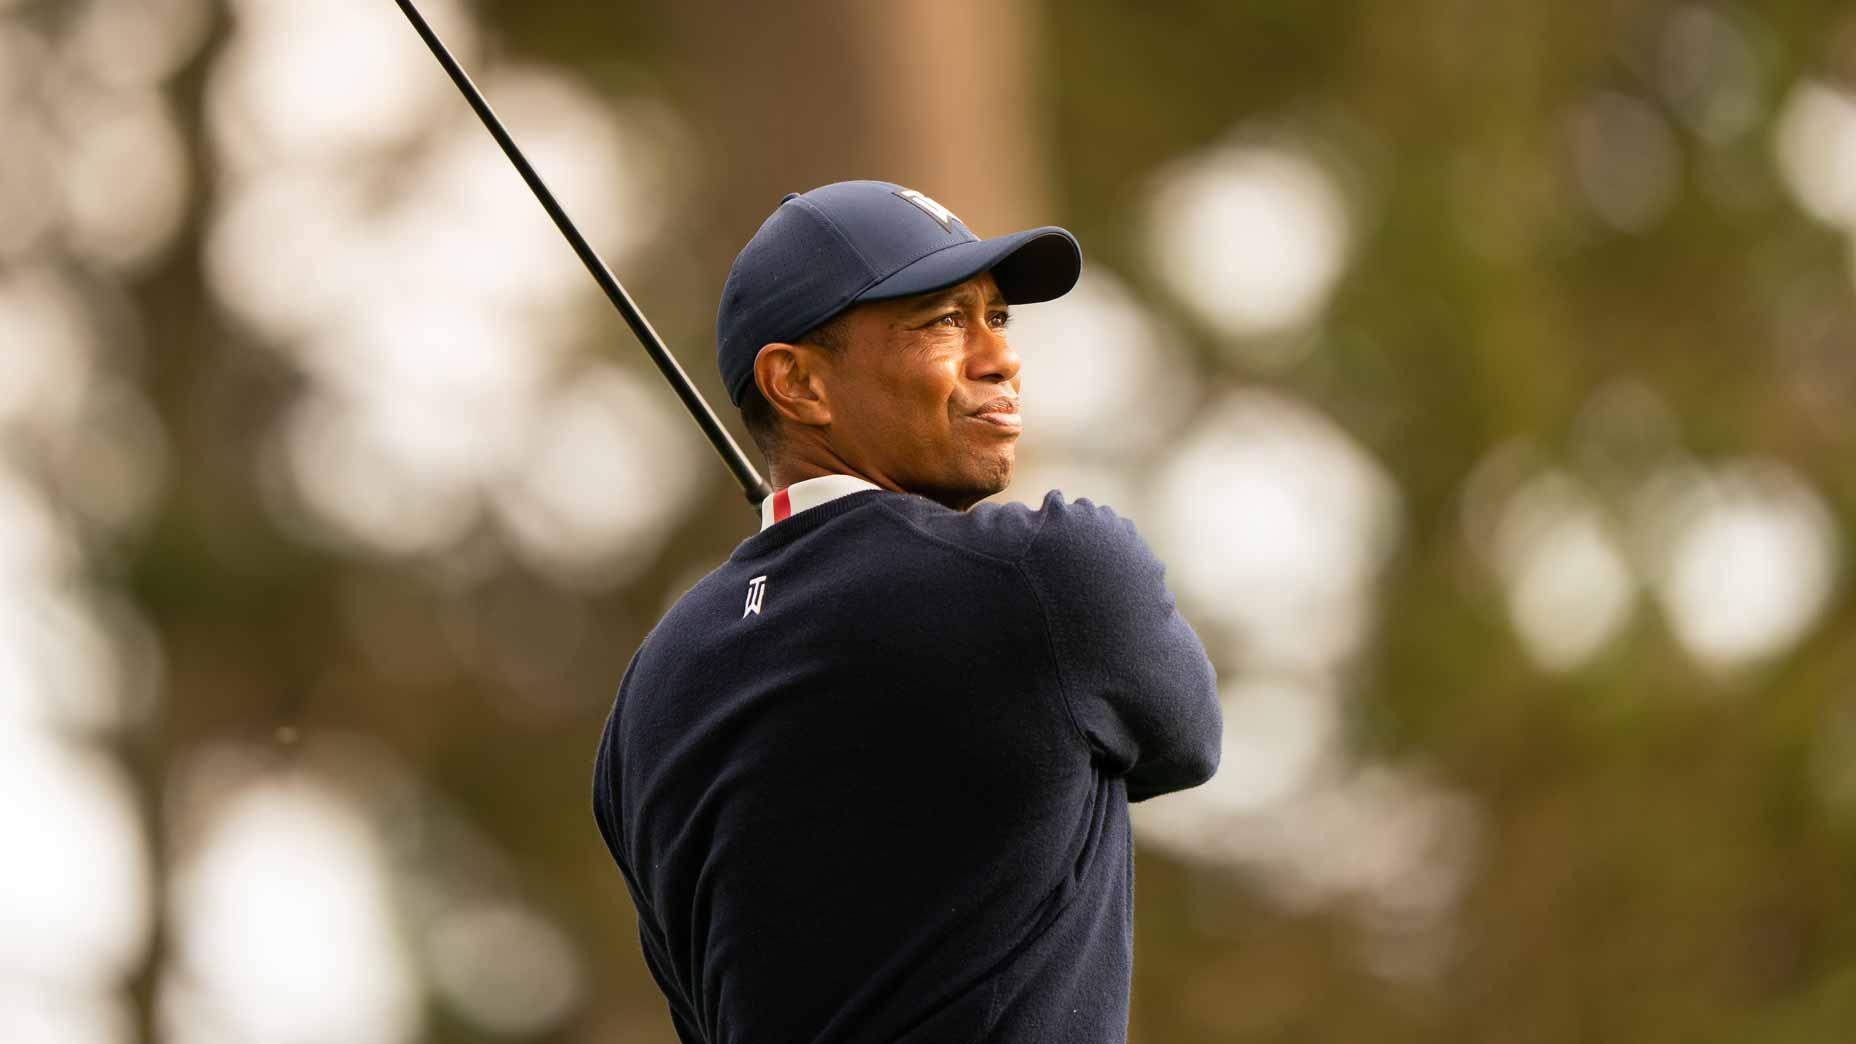 Pro golfer Tiger Woods at PGA Championship